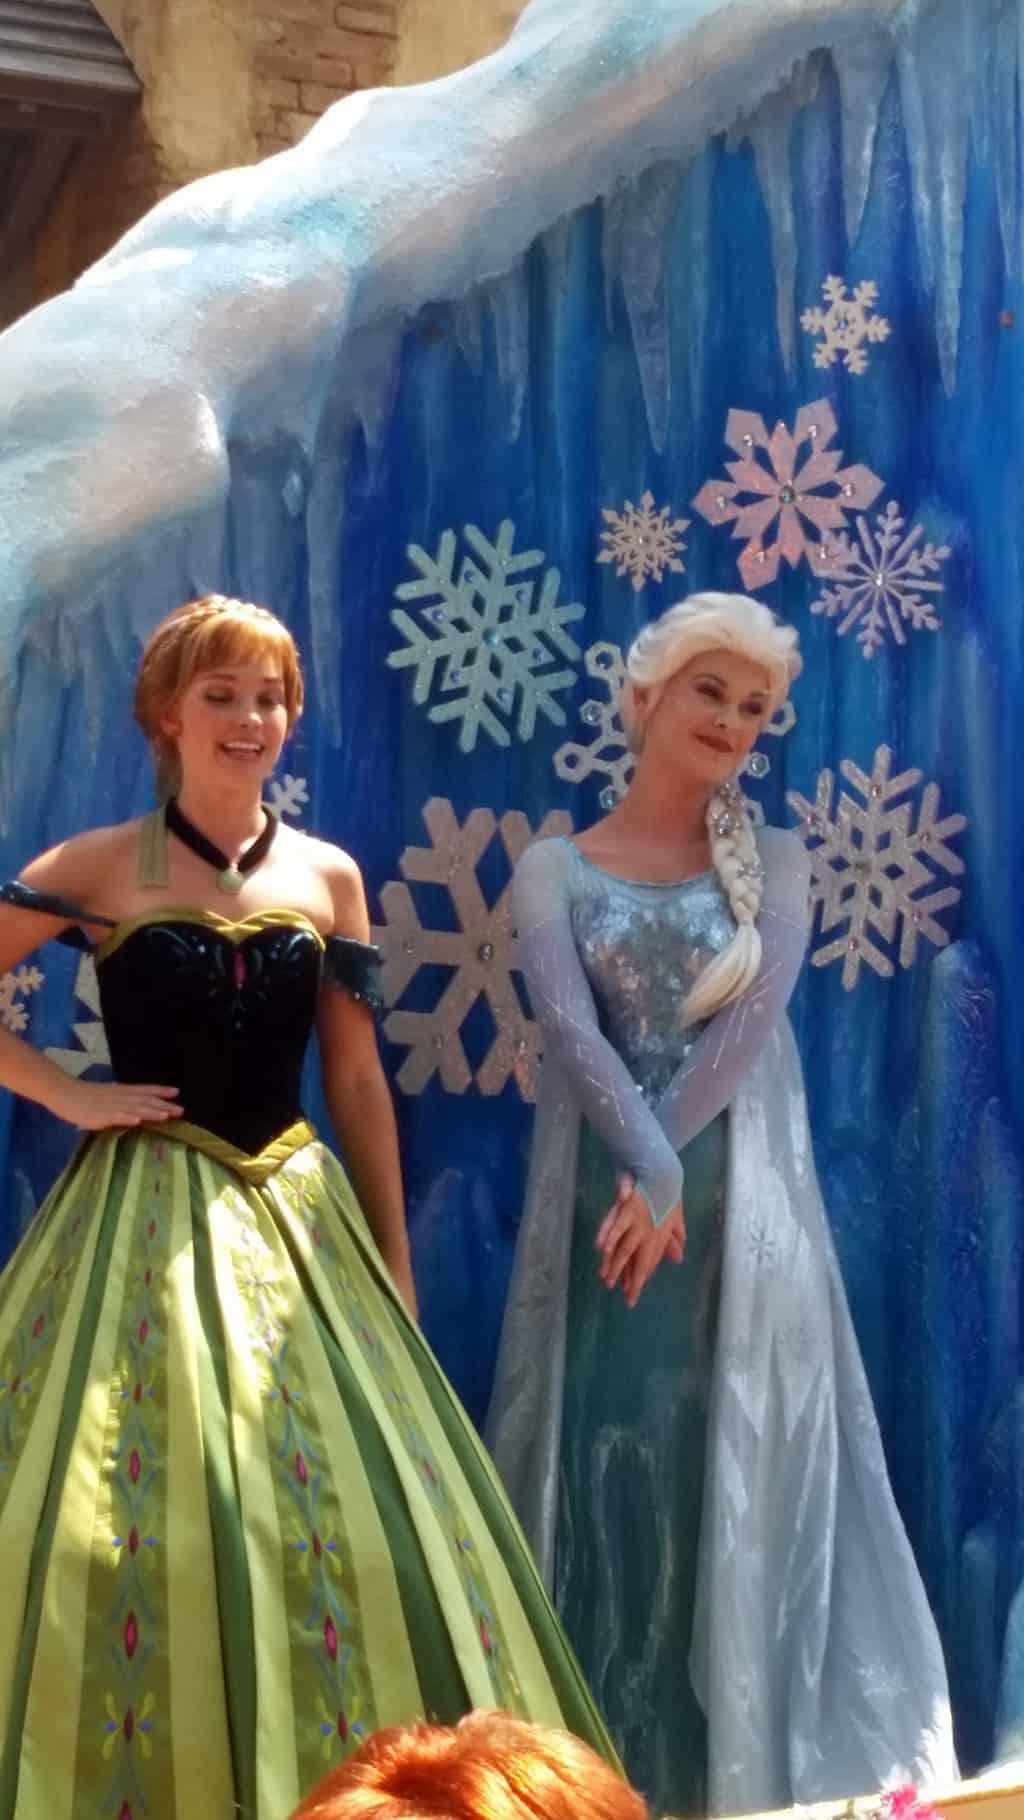 Festival of Fantasy Parade Anna and Elsa in Magic Kingdom